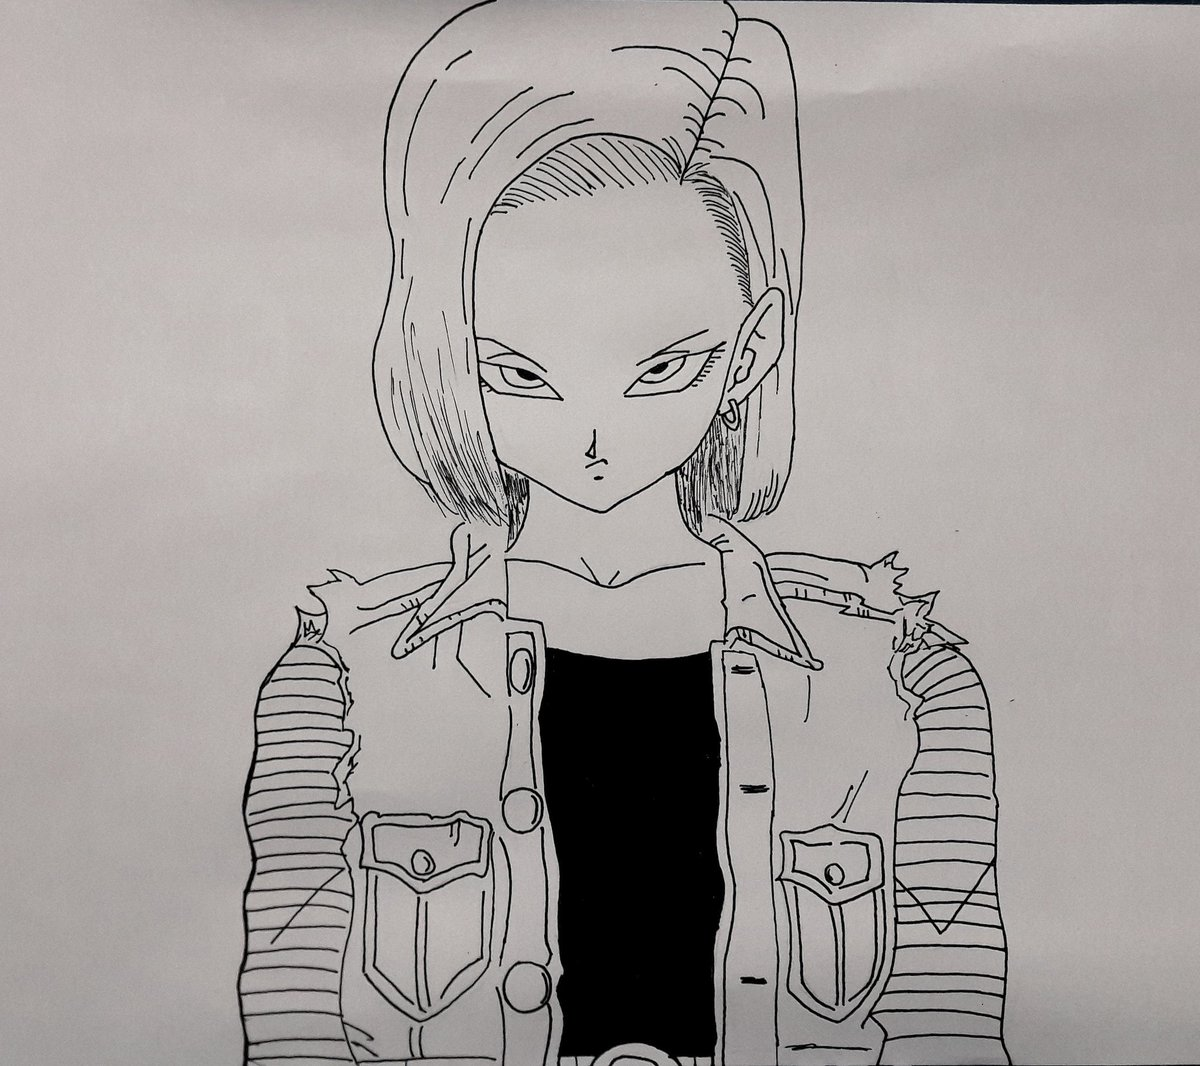 J M A V On Twitter Androide N 18 Dragon Ball Z 18 Draw Drawing Drawings Android Dragonballz Anime Dbz Goku Vegeta Manga Dragonballsuper Dragonballgt Gohan Trunks Db Supersaiyan Dbgt Bulma Goten Dbs Piccolo Ssj Art